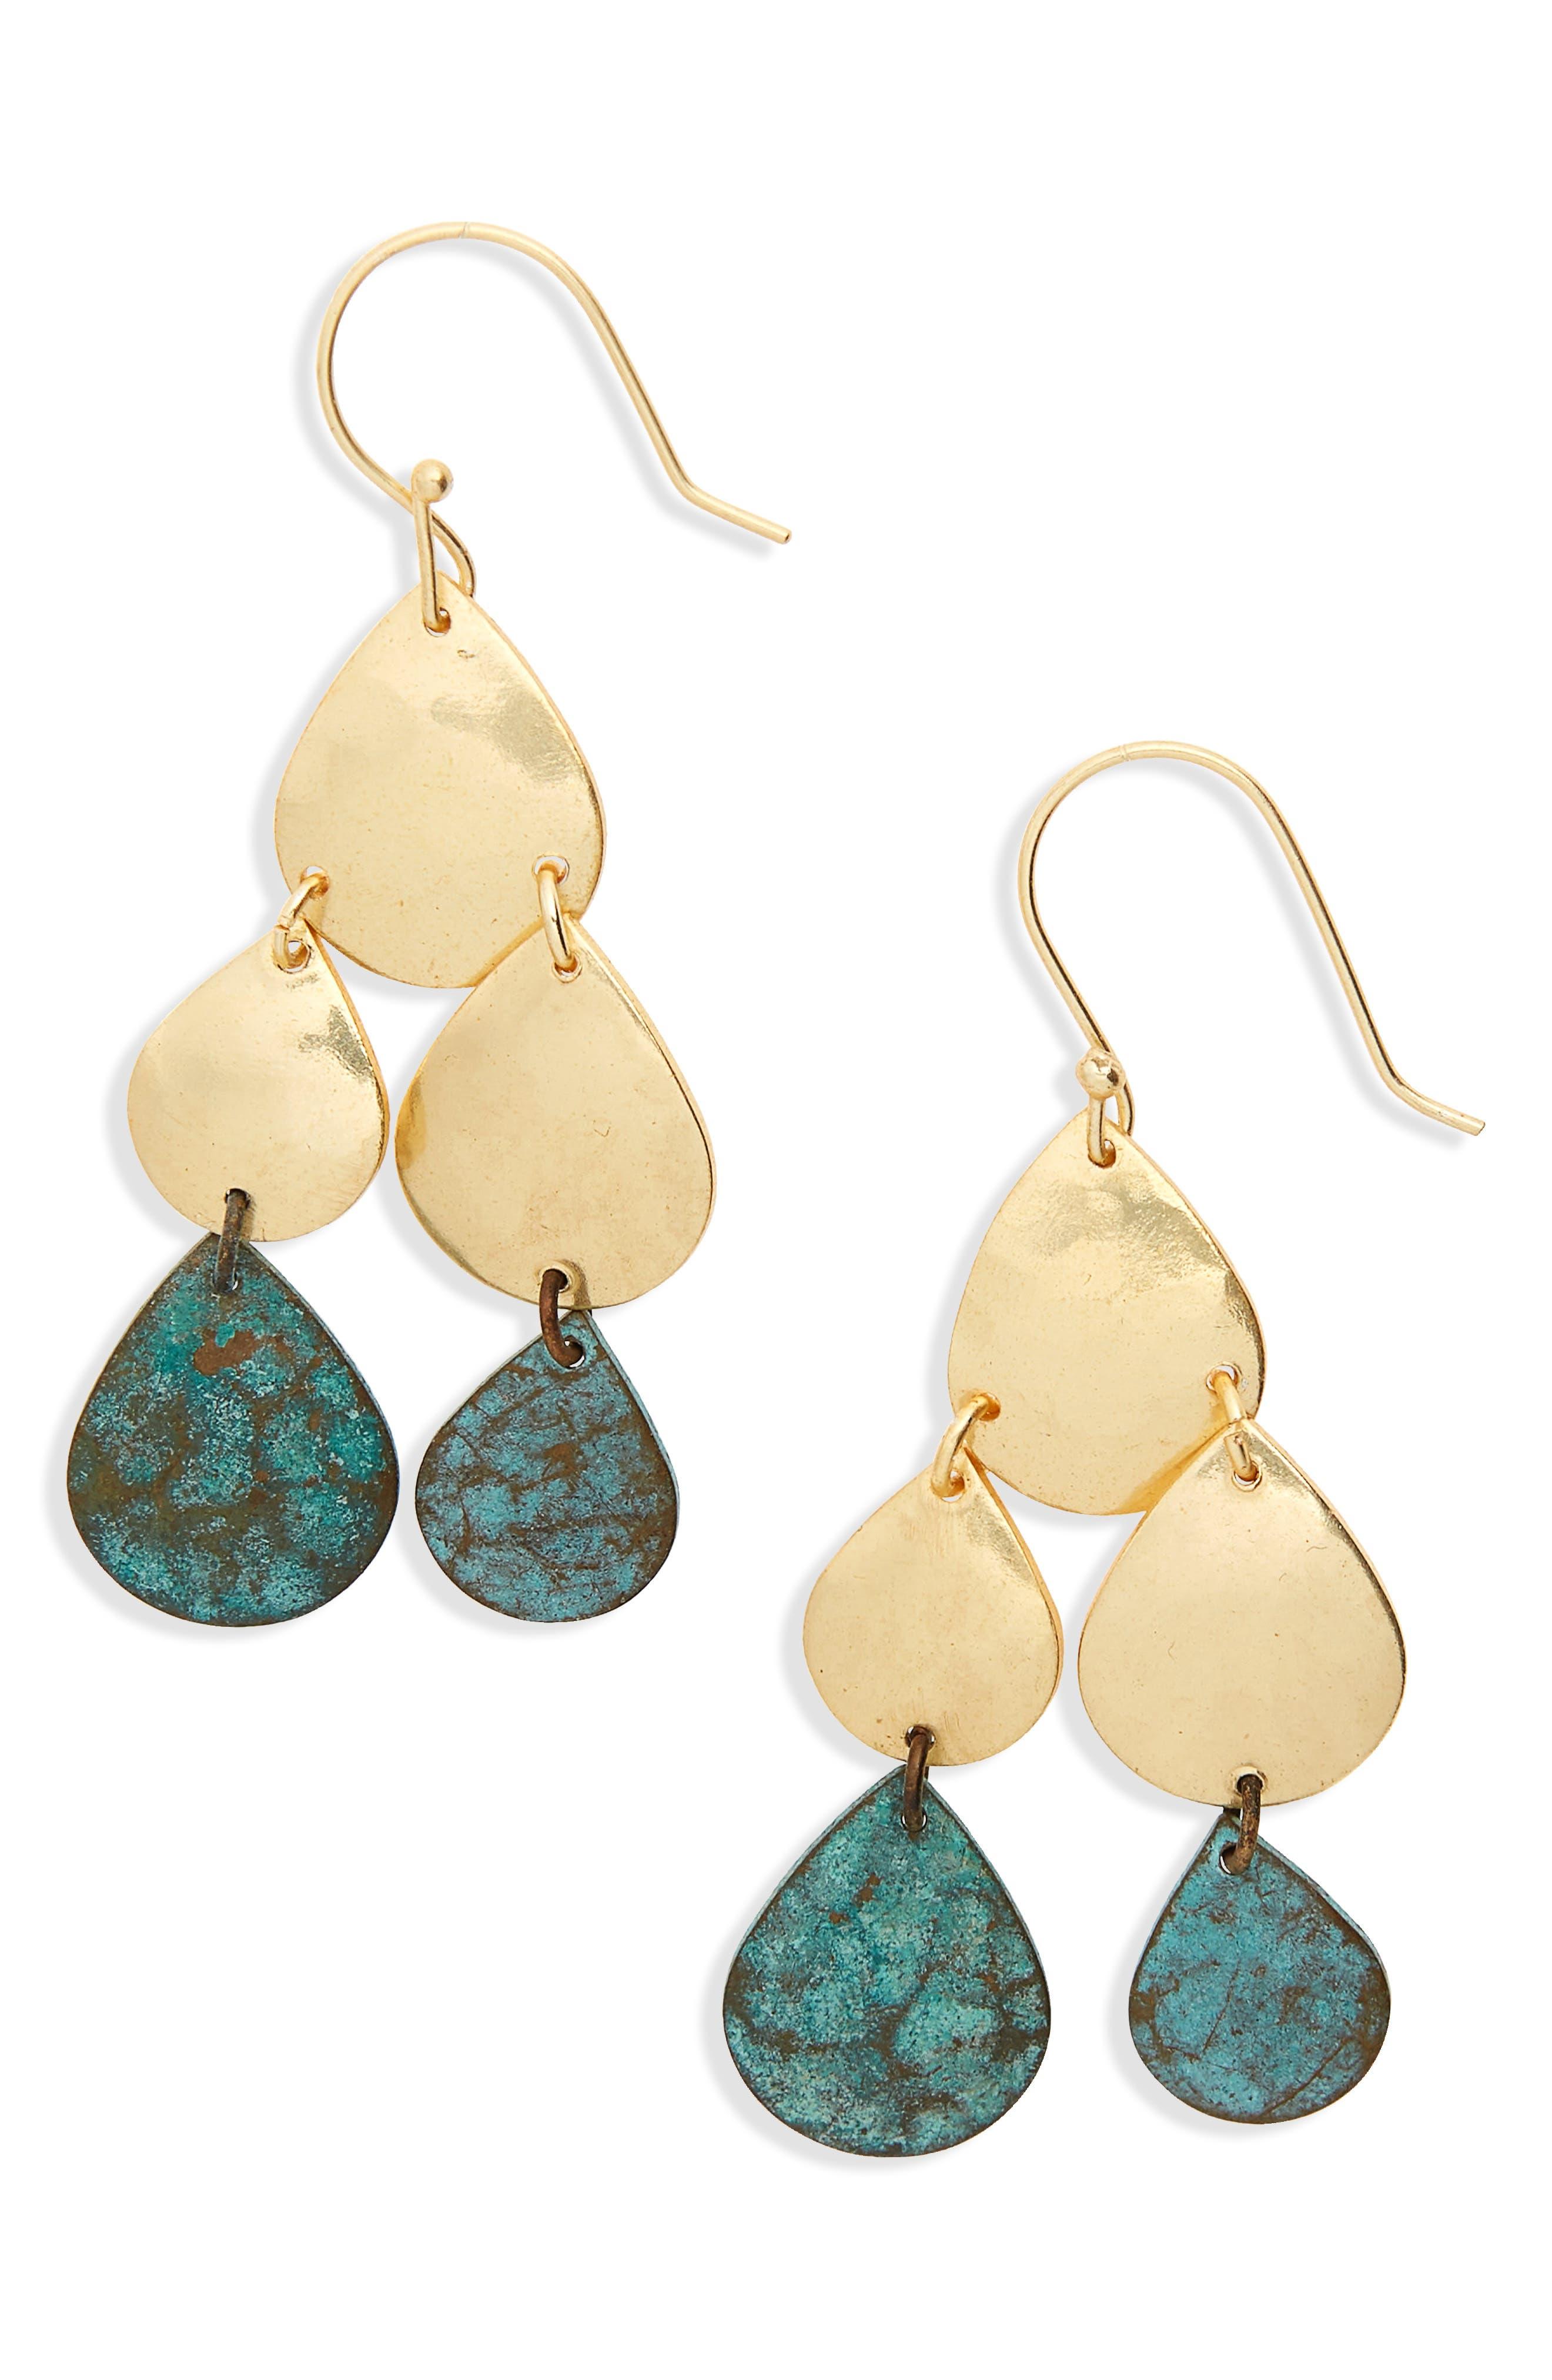 Patina Teardrops Earrings,                             Main thumbnail 1, color,                             Gold/ Multi